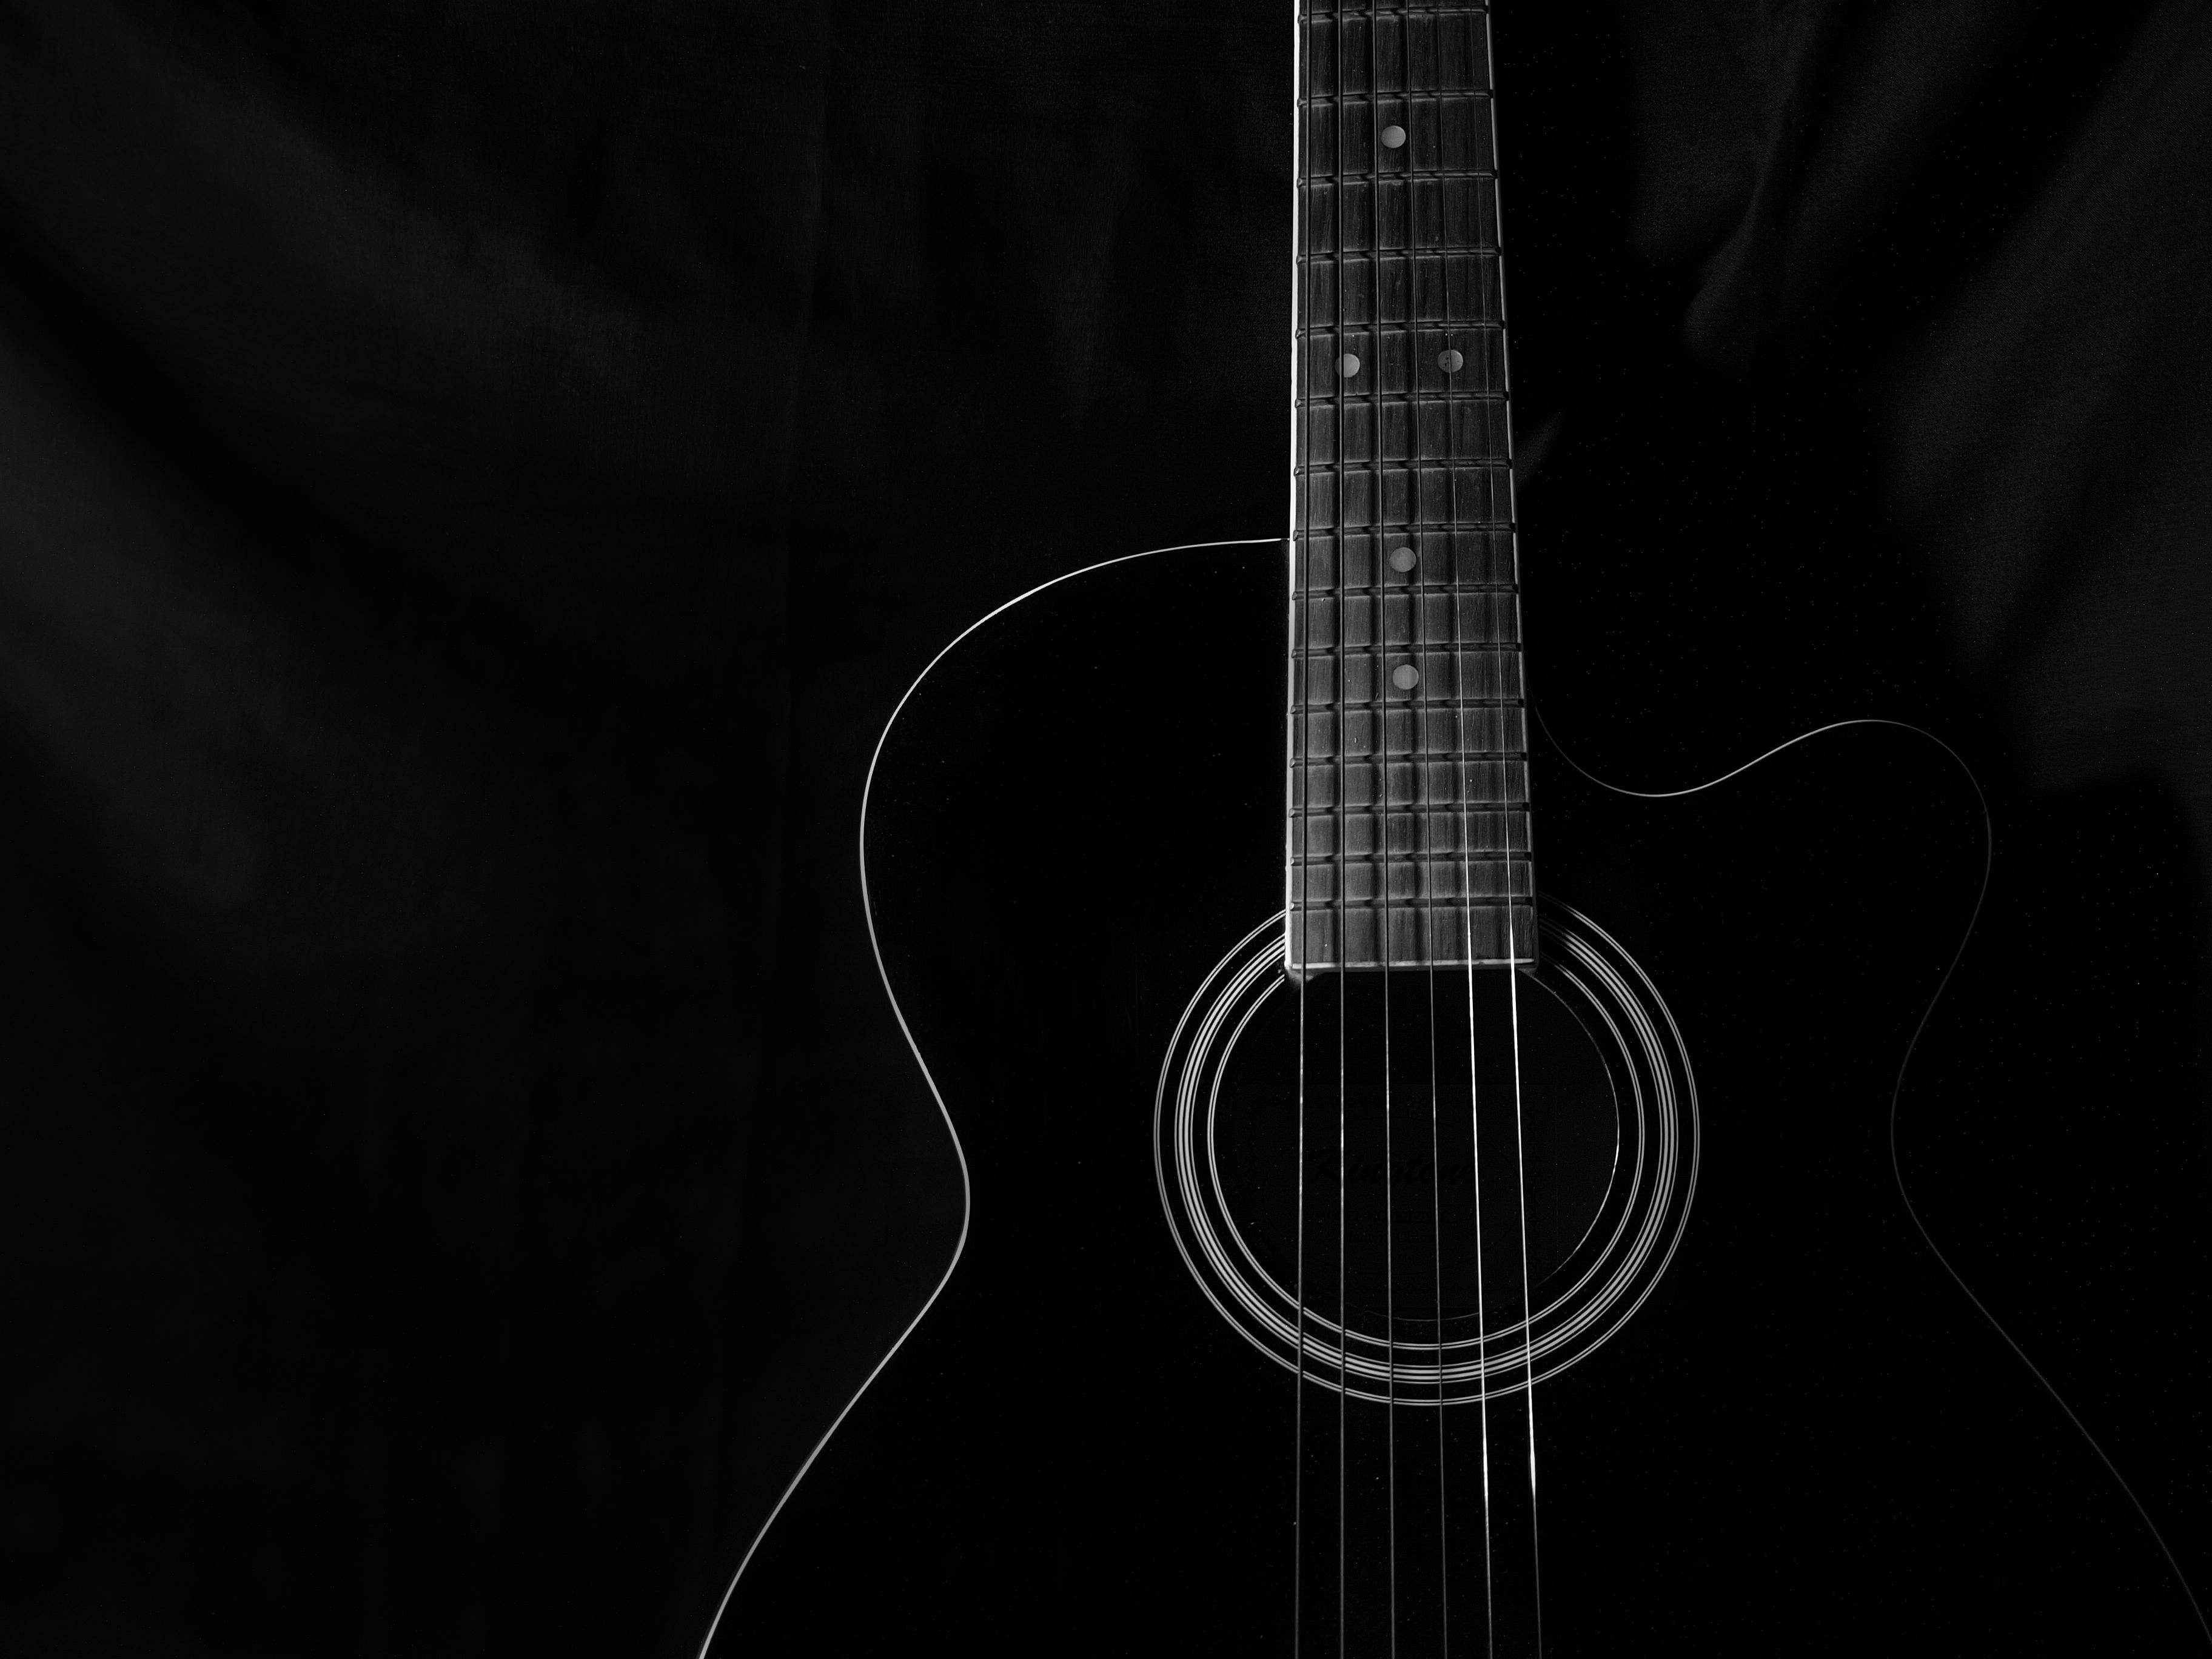 48 Guitar Wallpaper High Resolution On Wallpapersafari